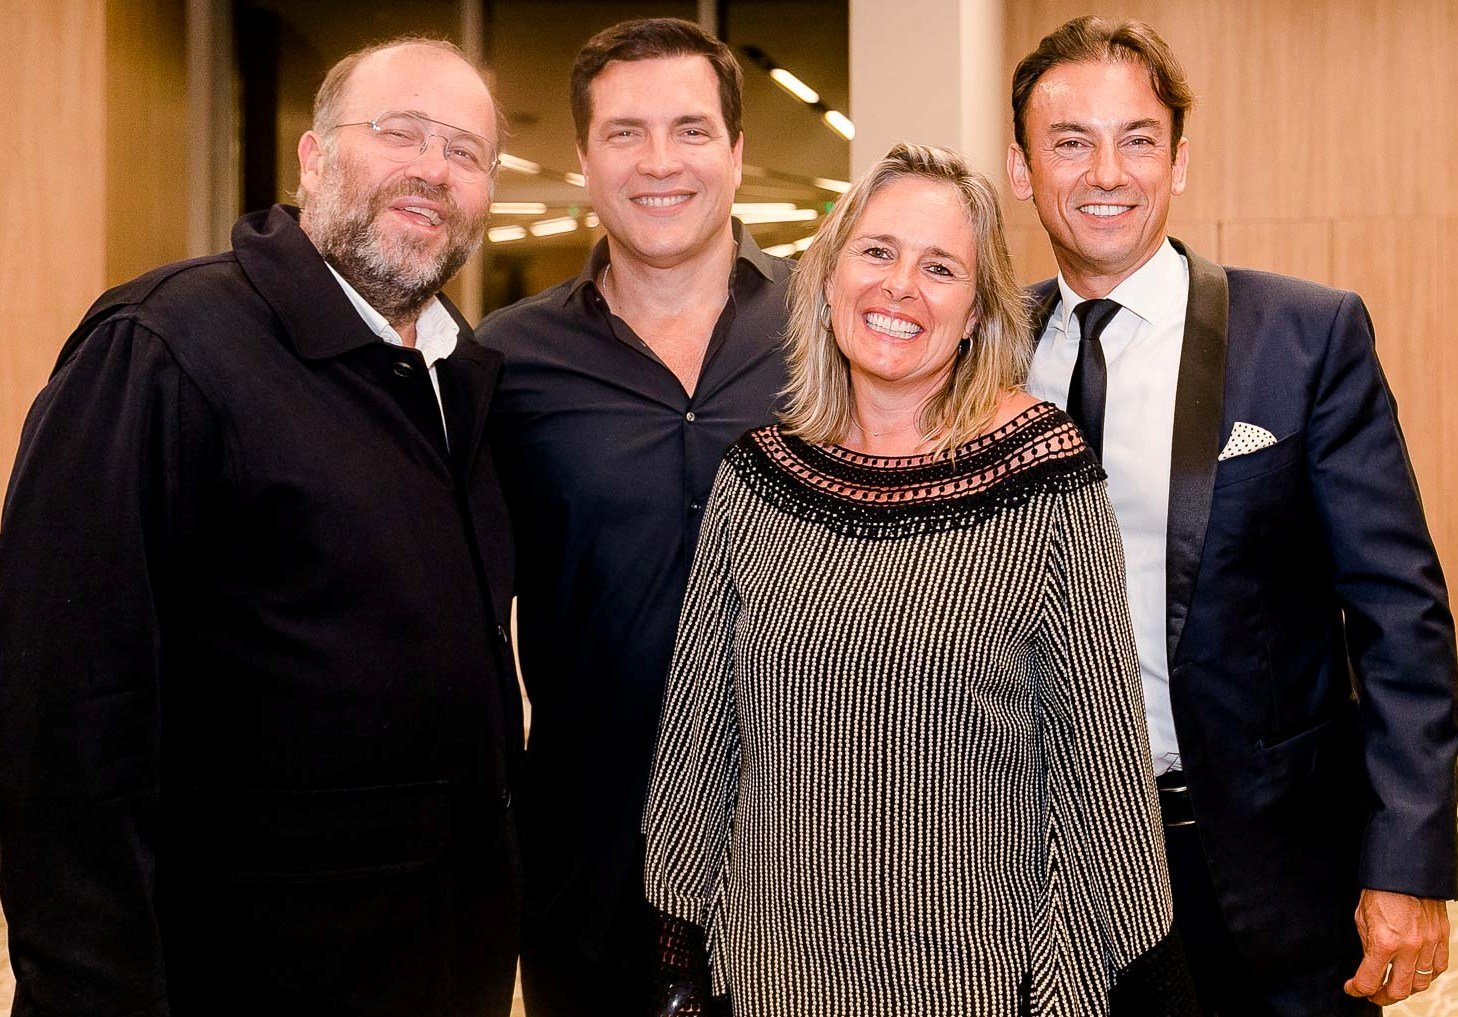 Otávio Müller, Daniel Boaventura e o casal Frédérique e Patrick Mendes /Foto: Bruno Ryfer